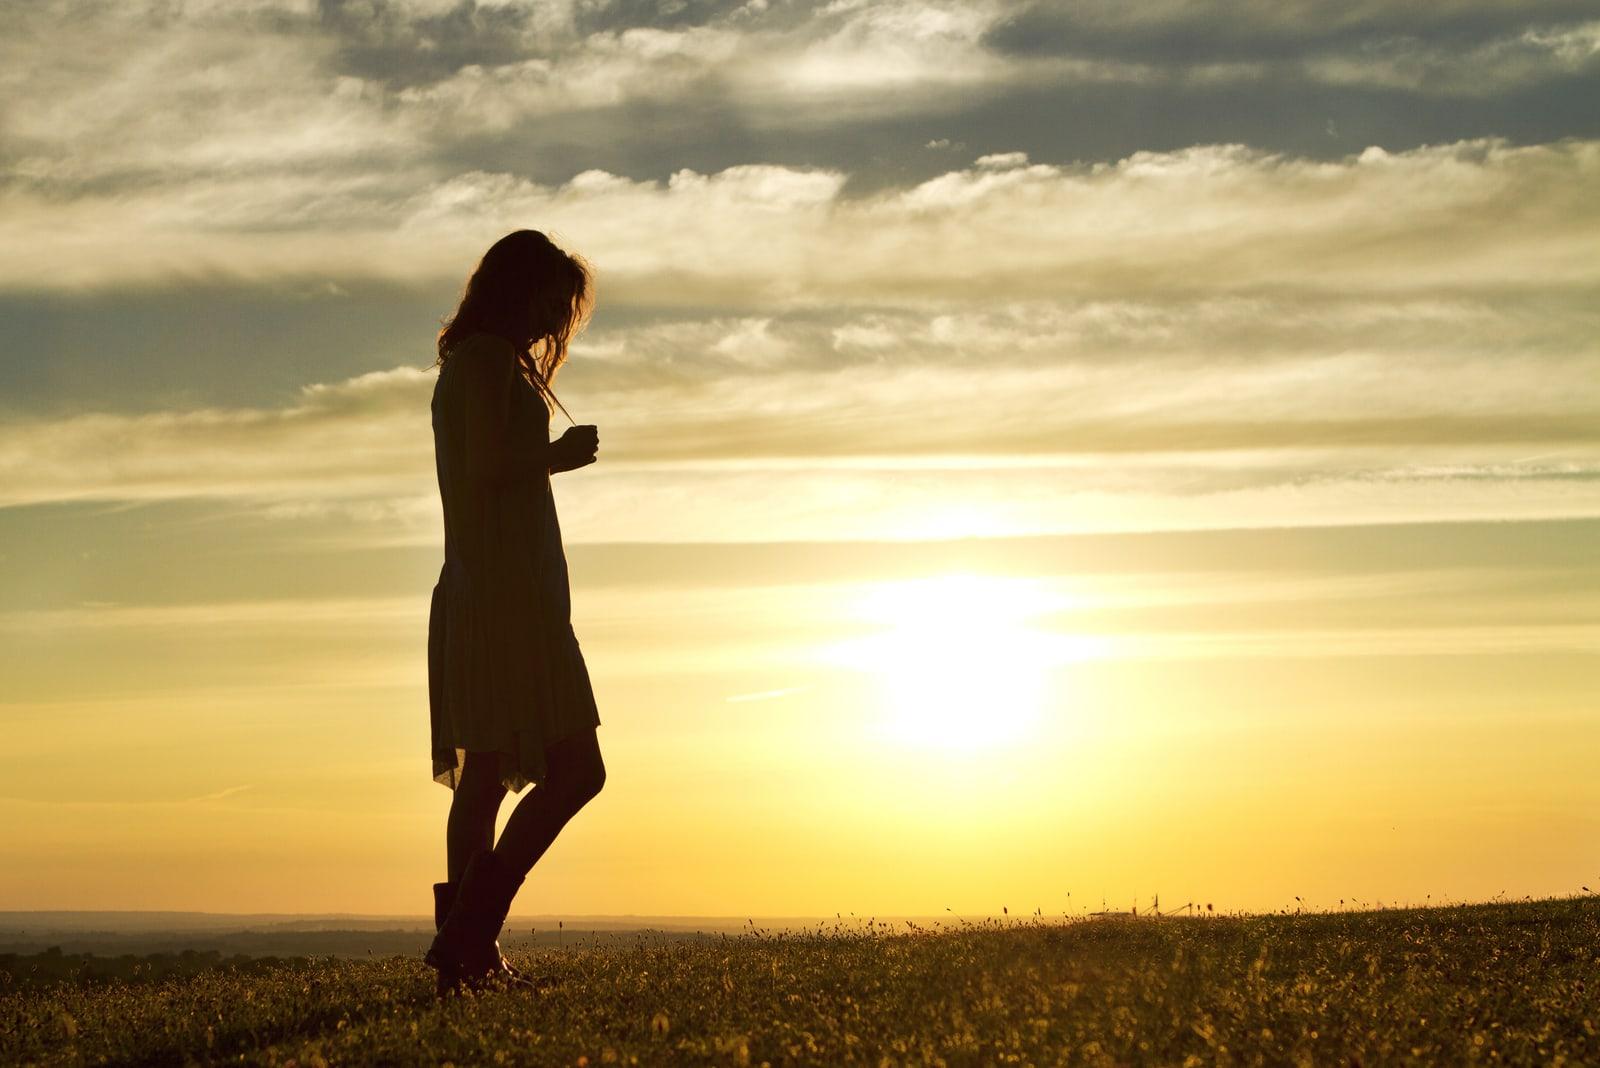 a woman walks through a meadow at sunset